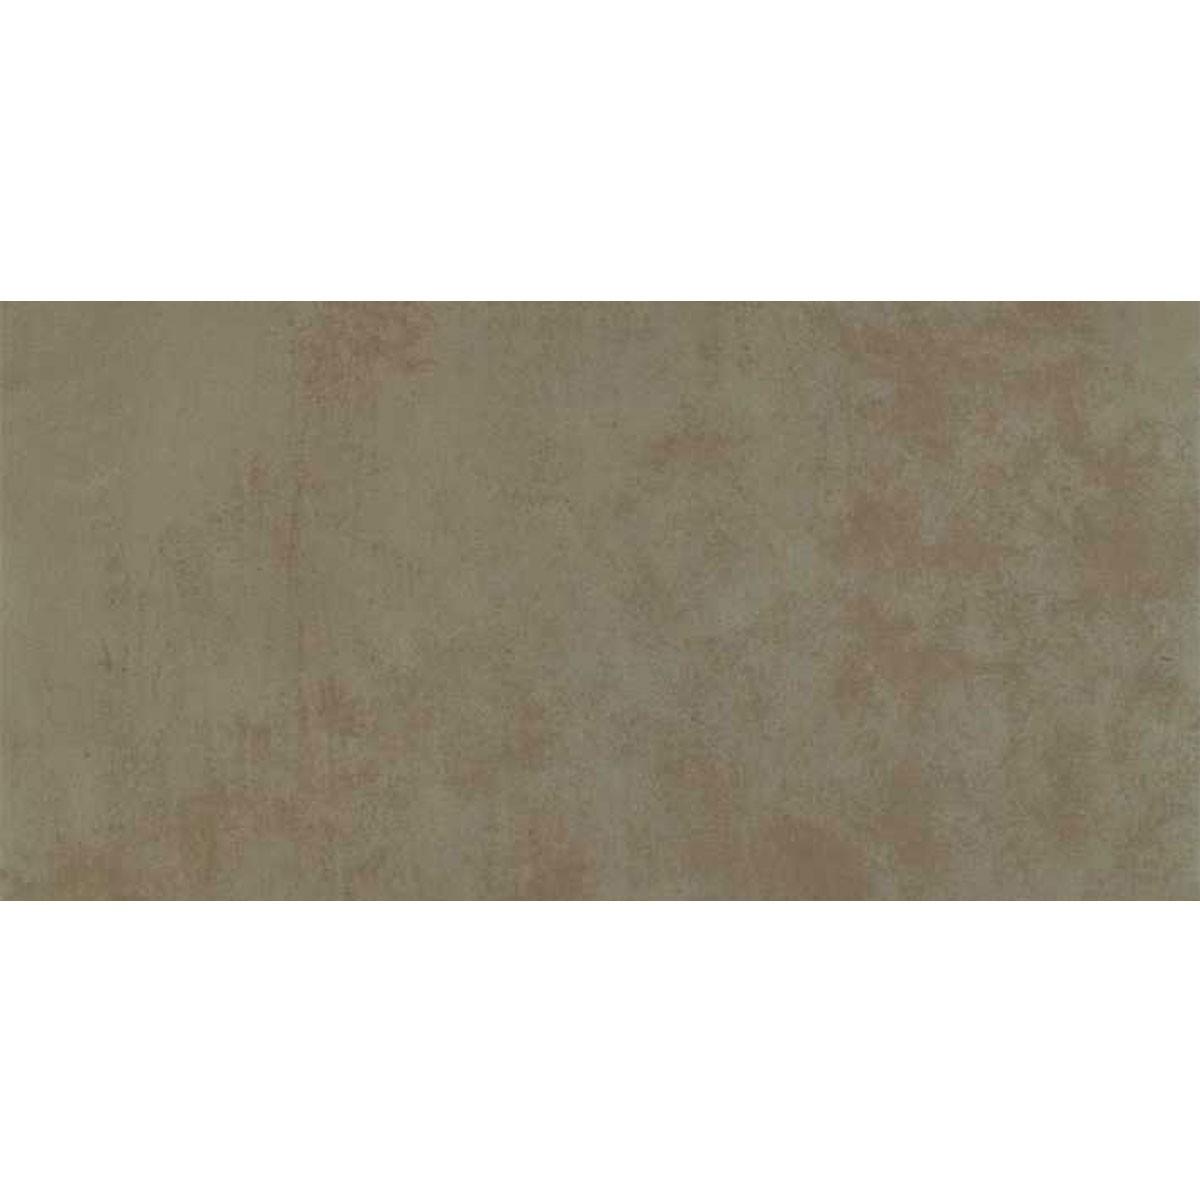 24 x 12 In. Brown Porcelain Floor Tile - 8 Pcs/Case (15.50 sq.ft/Case) (UR60D)